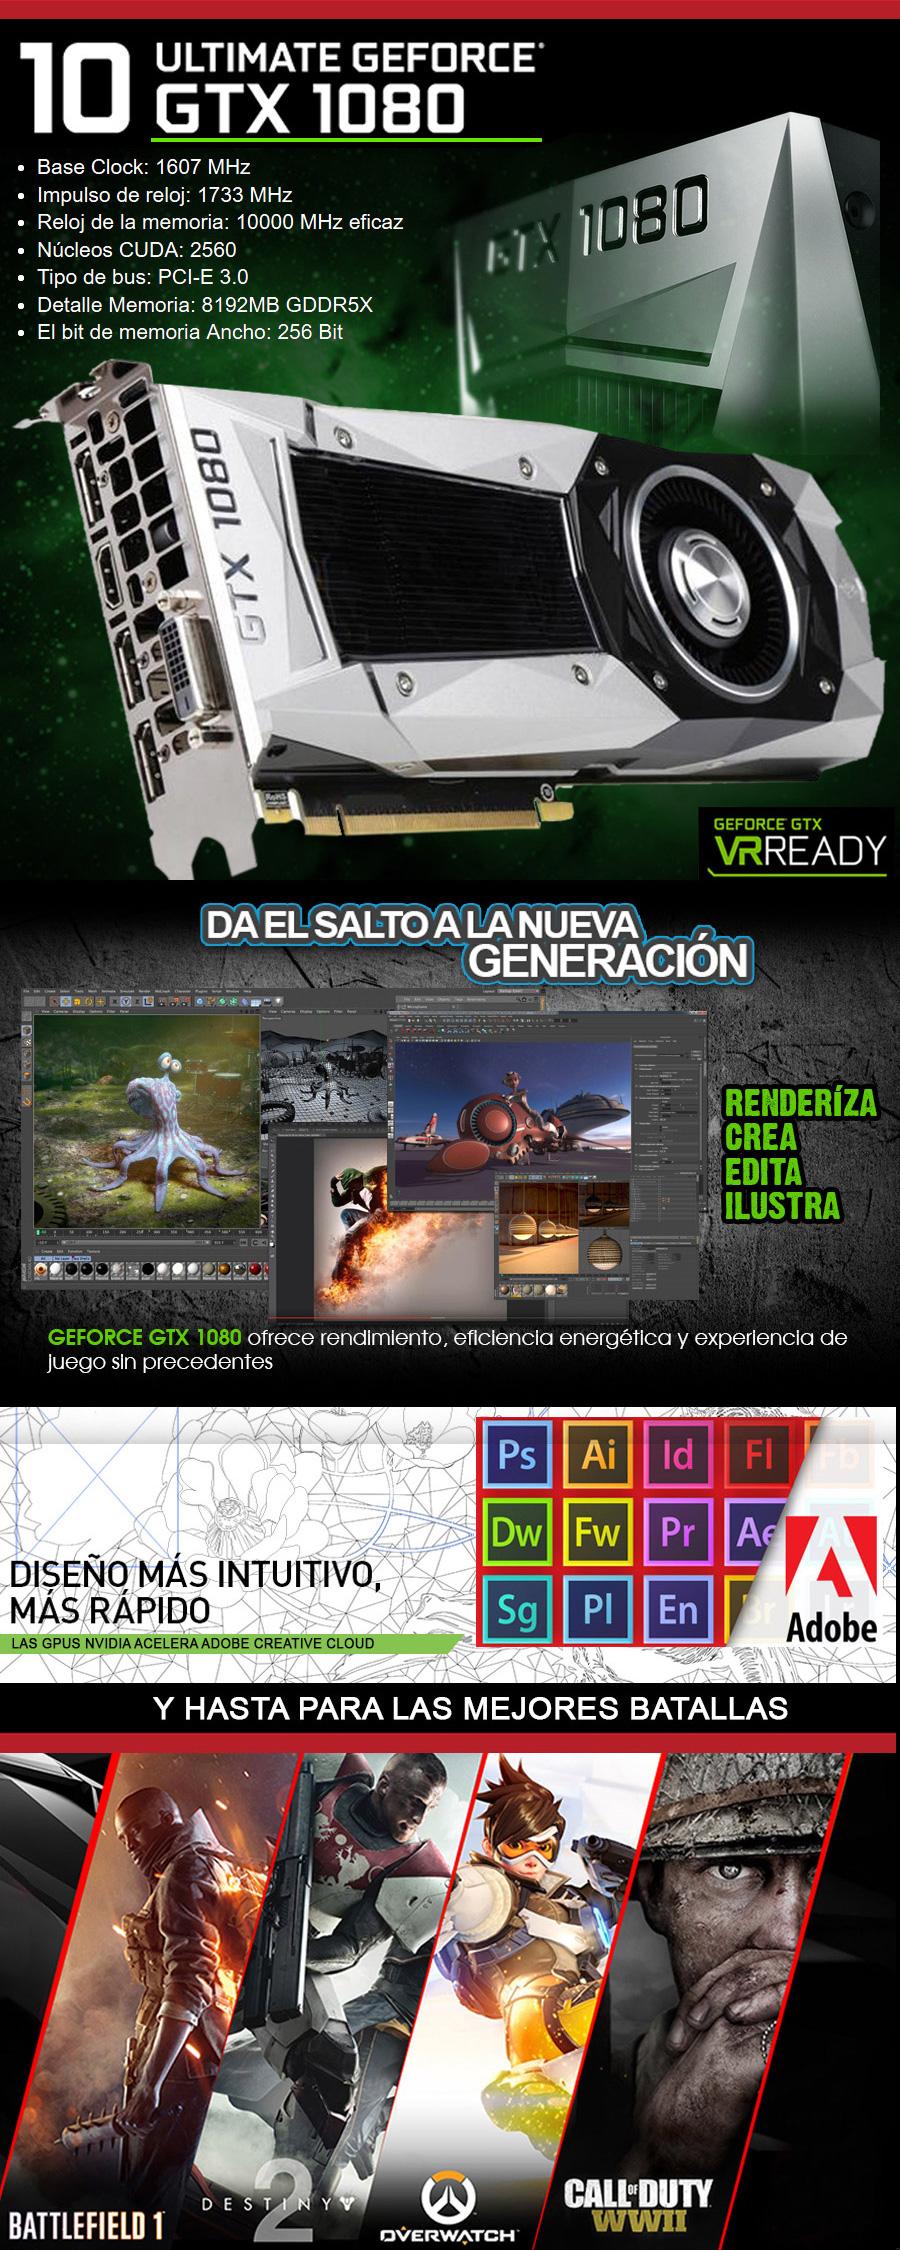 PC GAMER GAMA ALTA CON NVIDIA GTX 1080 8GB DDR5X EN MEXICO